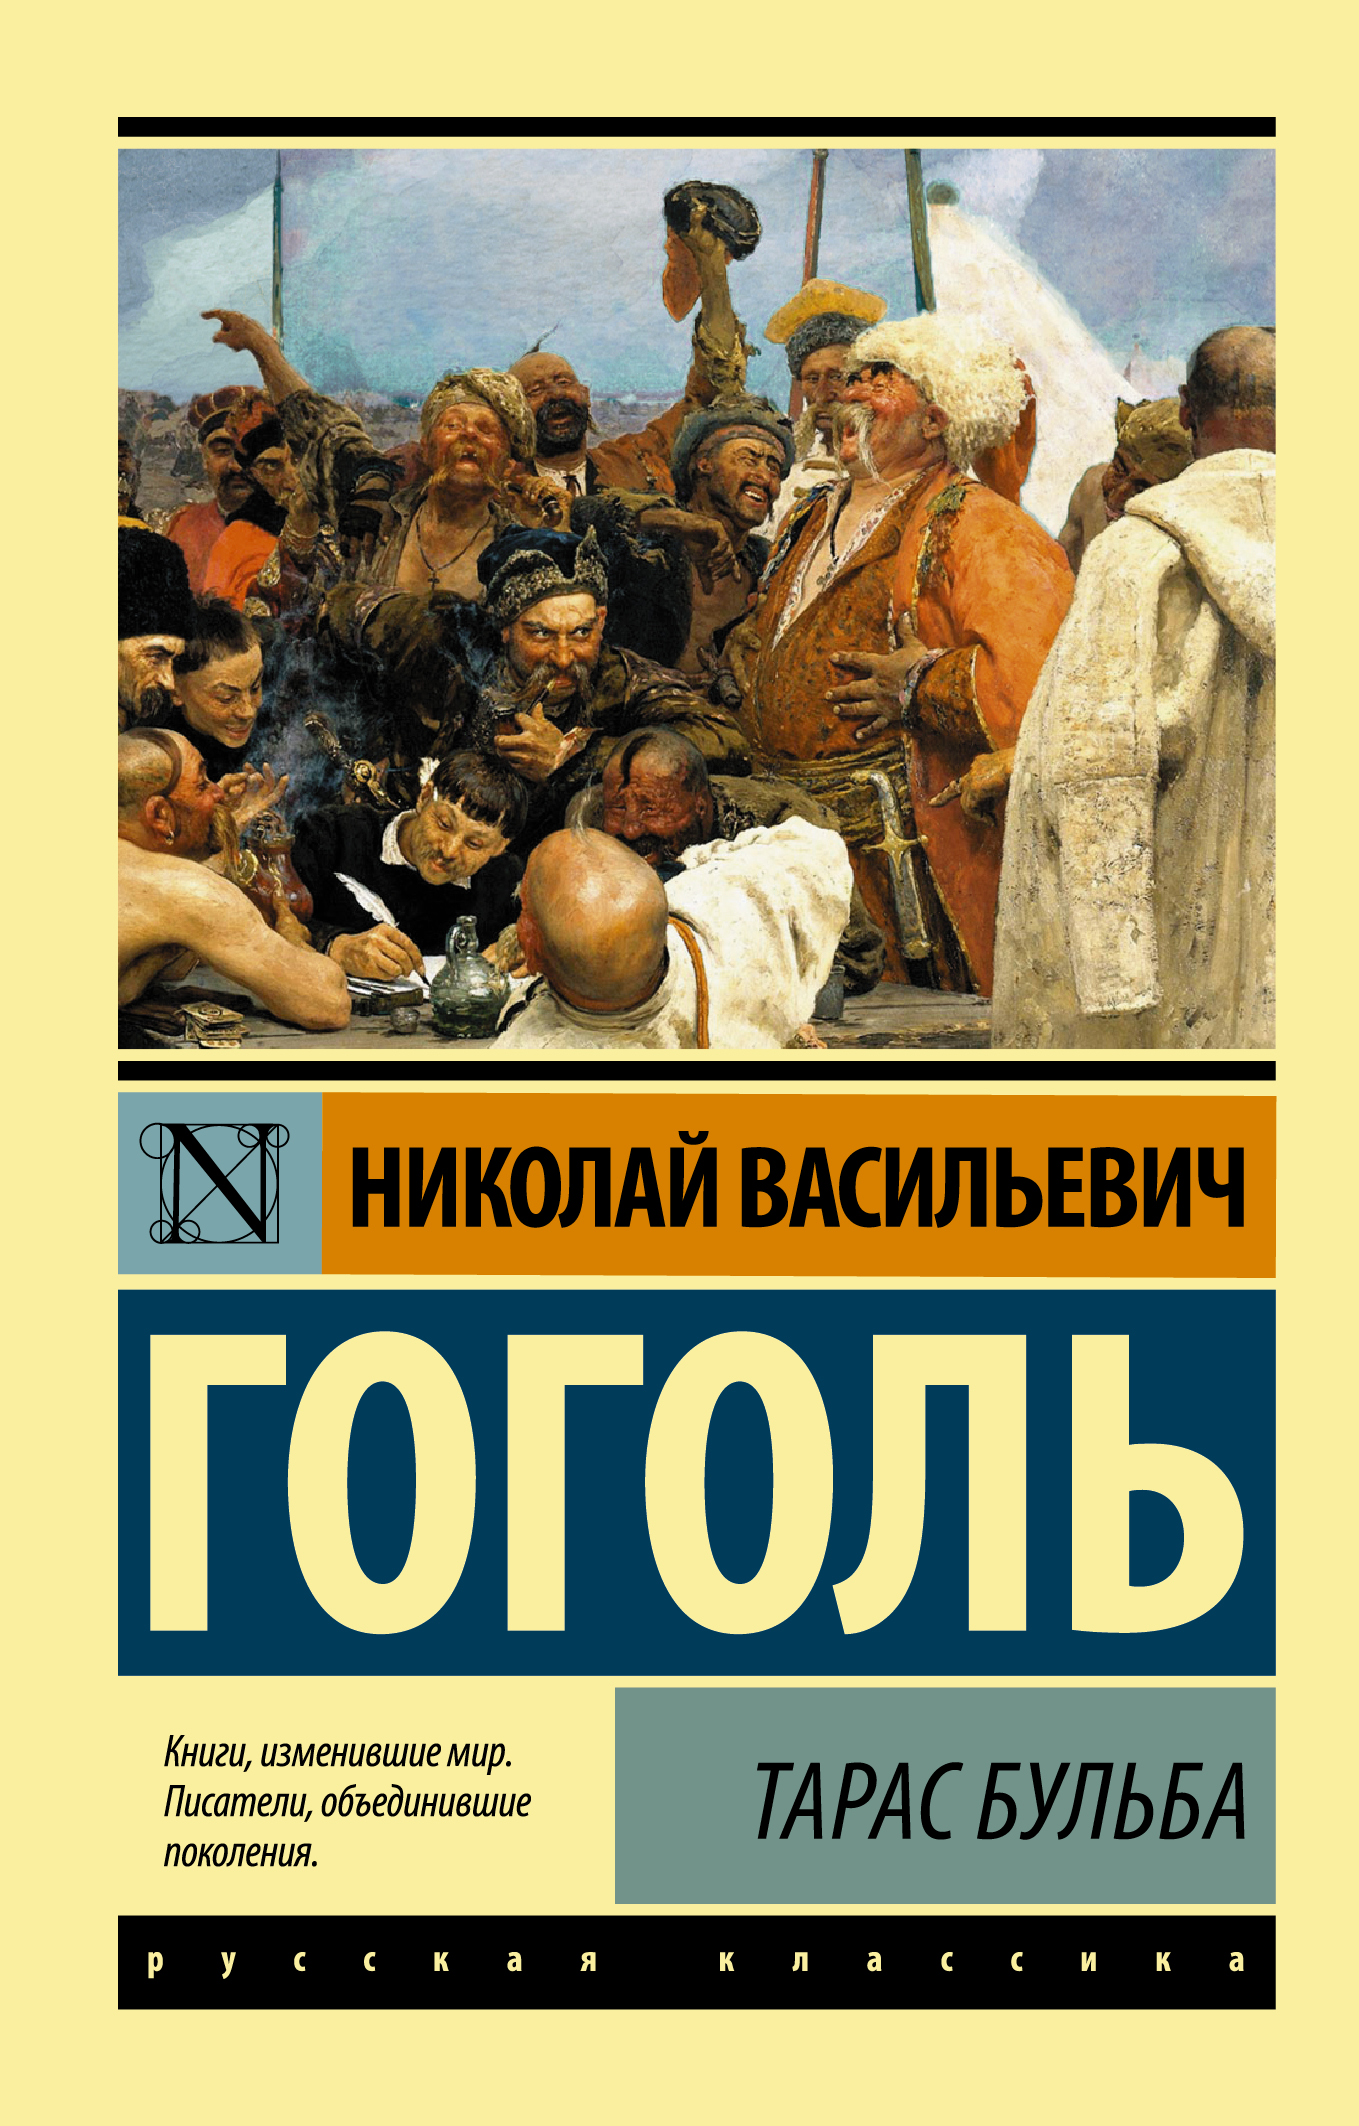 Николай Васильевич Гоголь Тарас Бульба